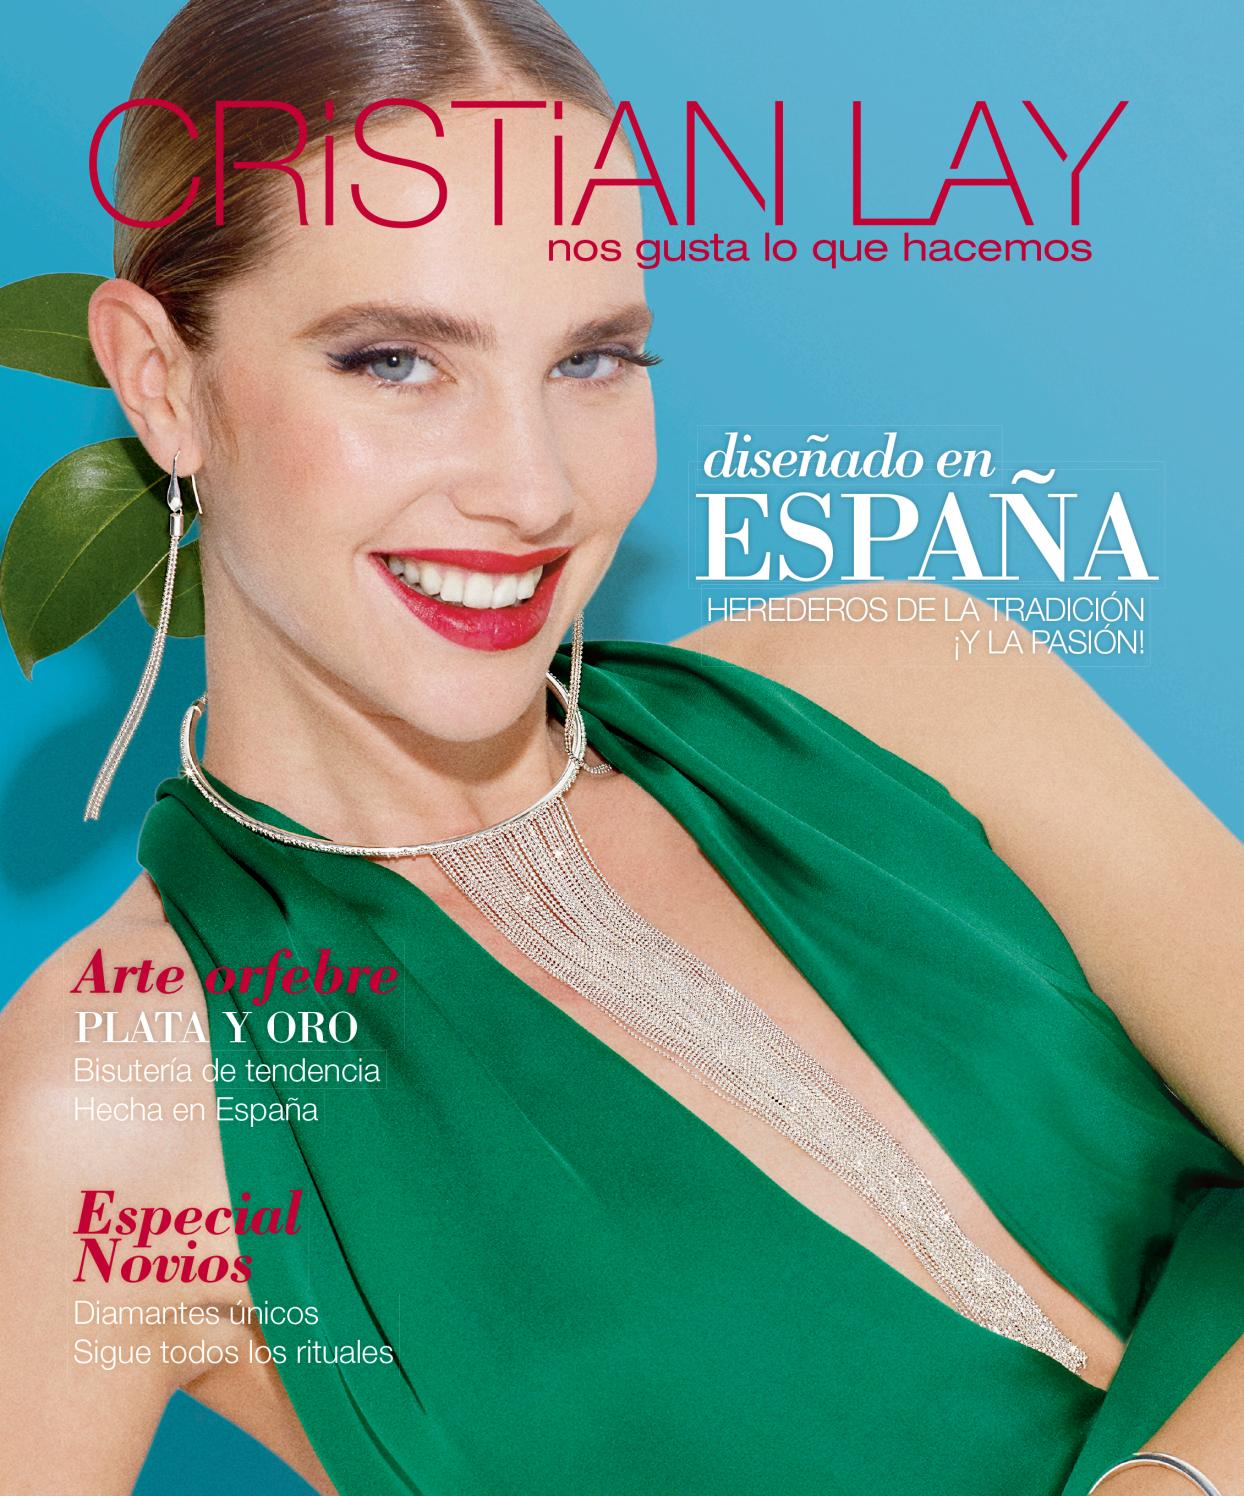 bf44c08dccf6 Catálogo General 2 Península y Baleares by Cristian Lay - issuu